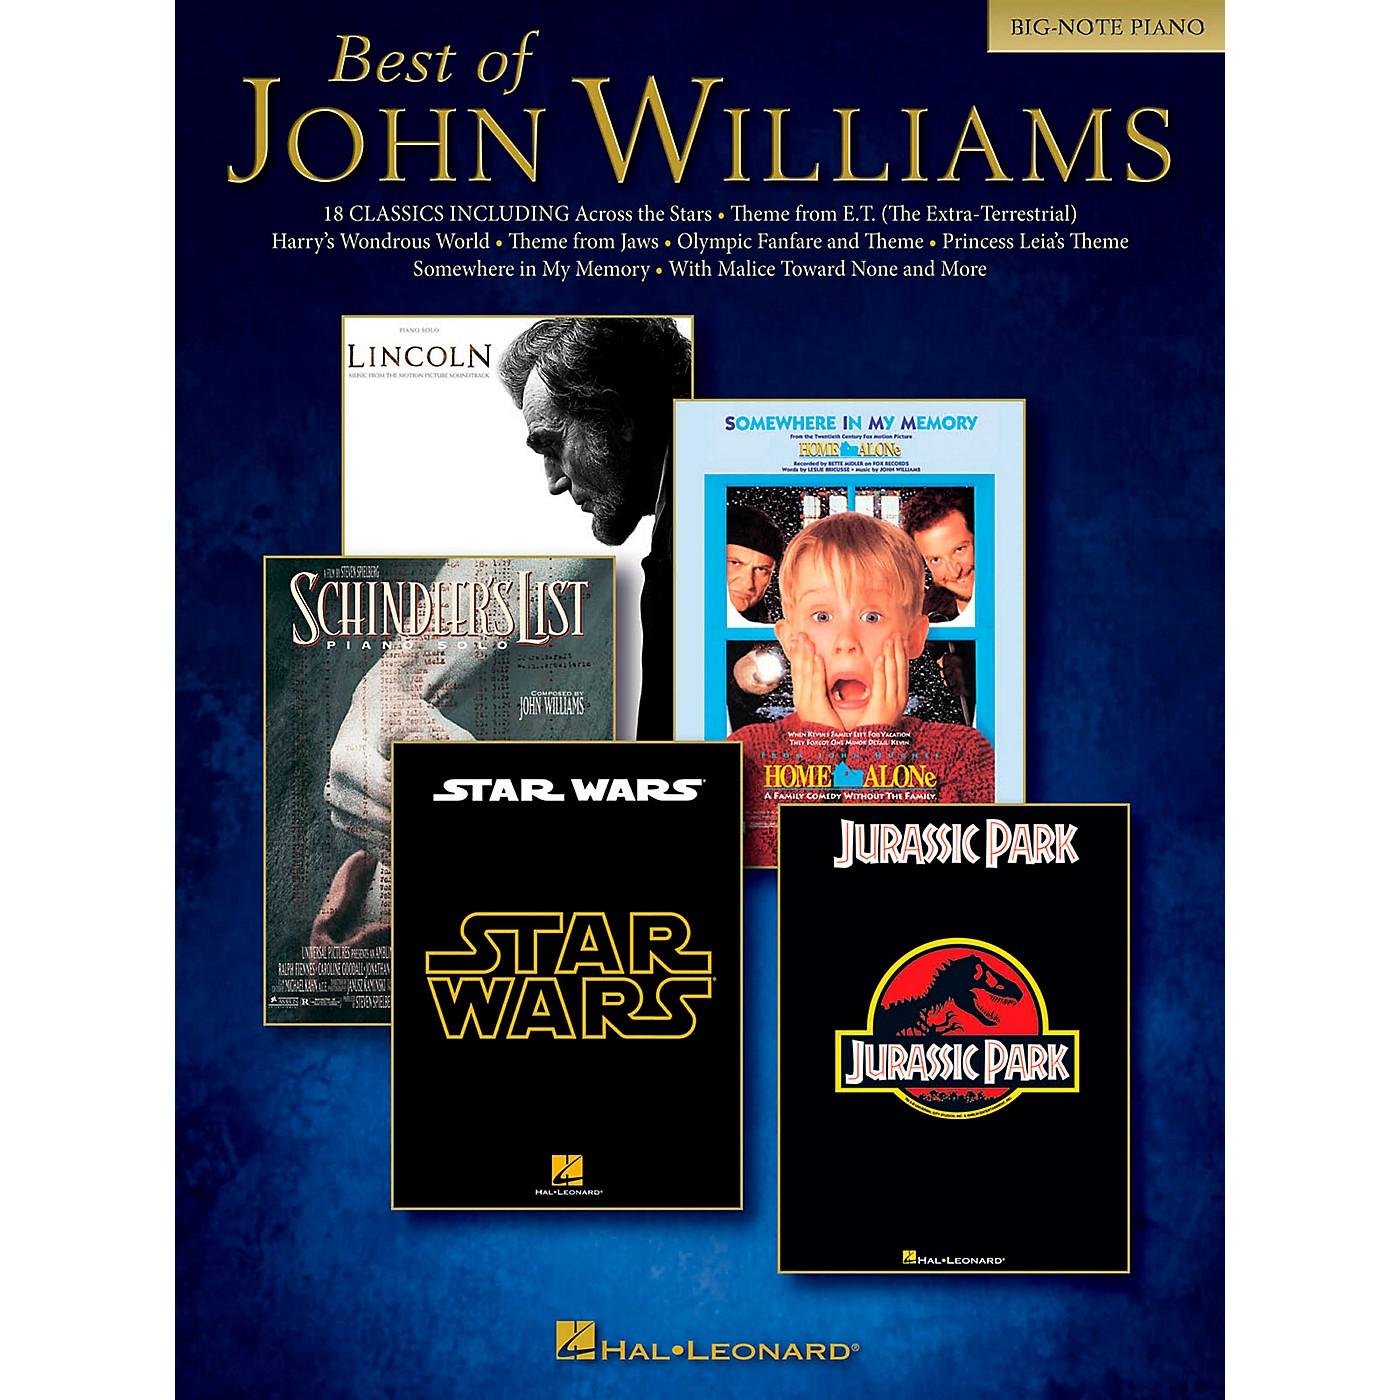 Hal Leonard Best Of John Williams For Big Note Piano thumbnail